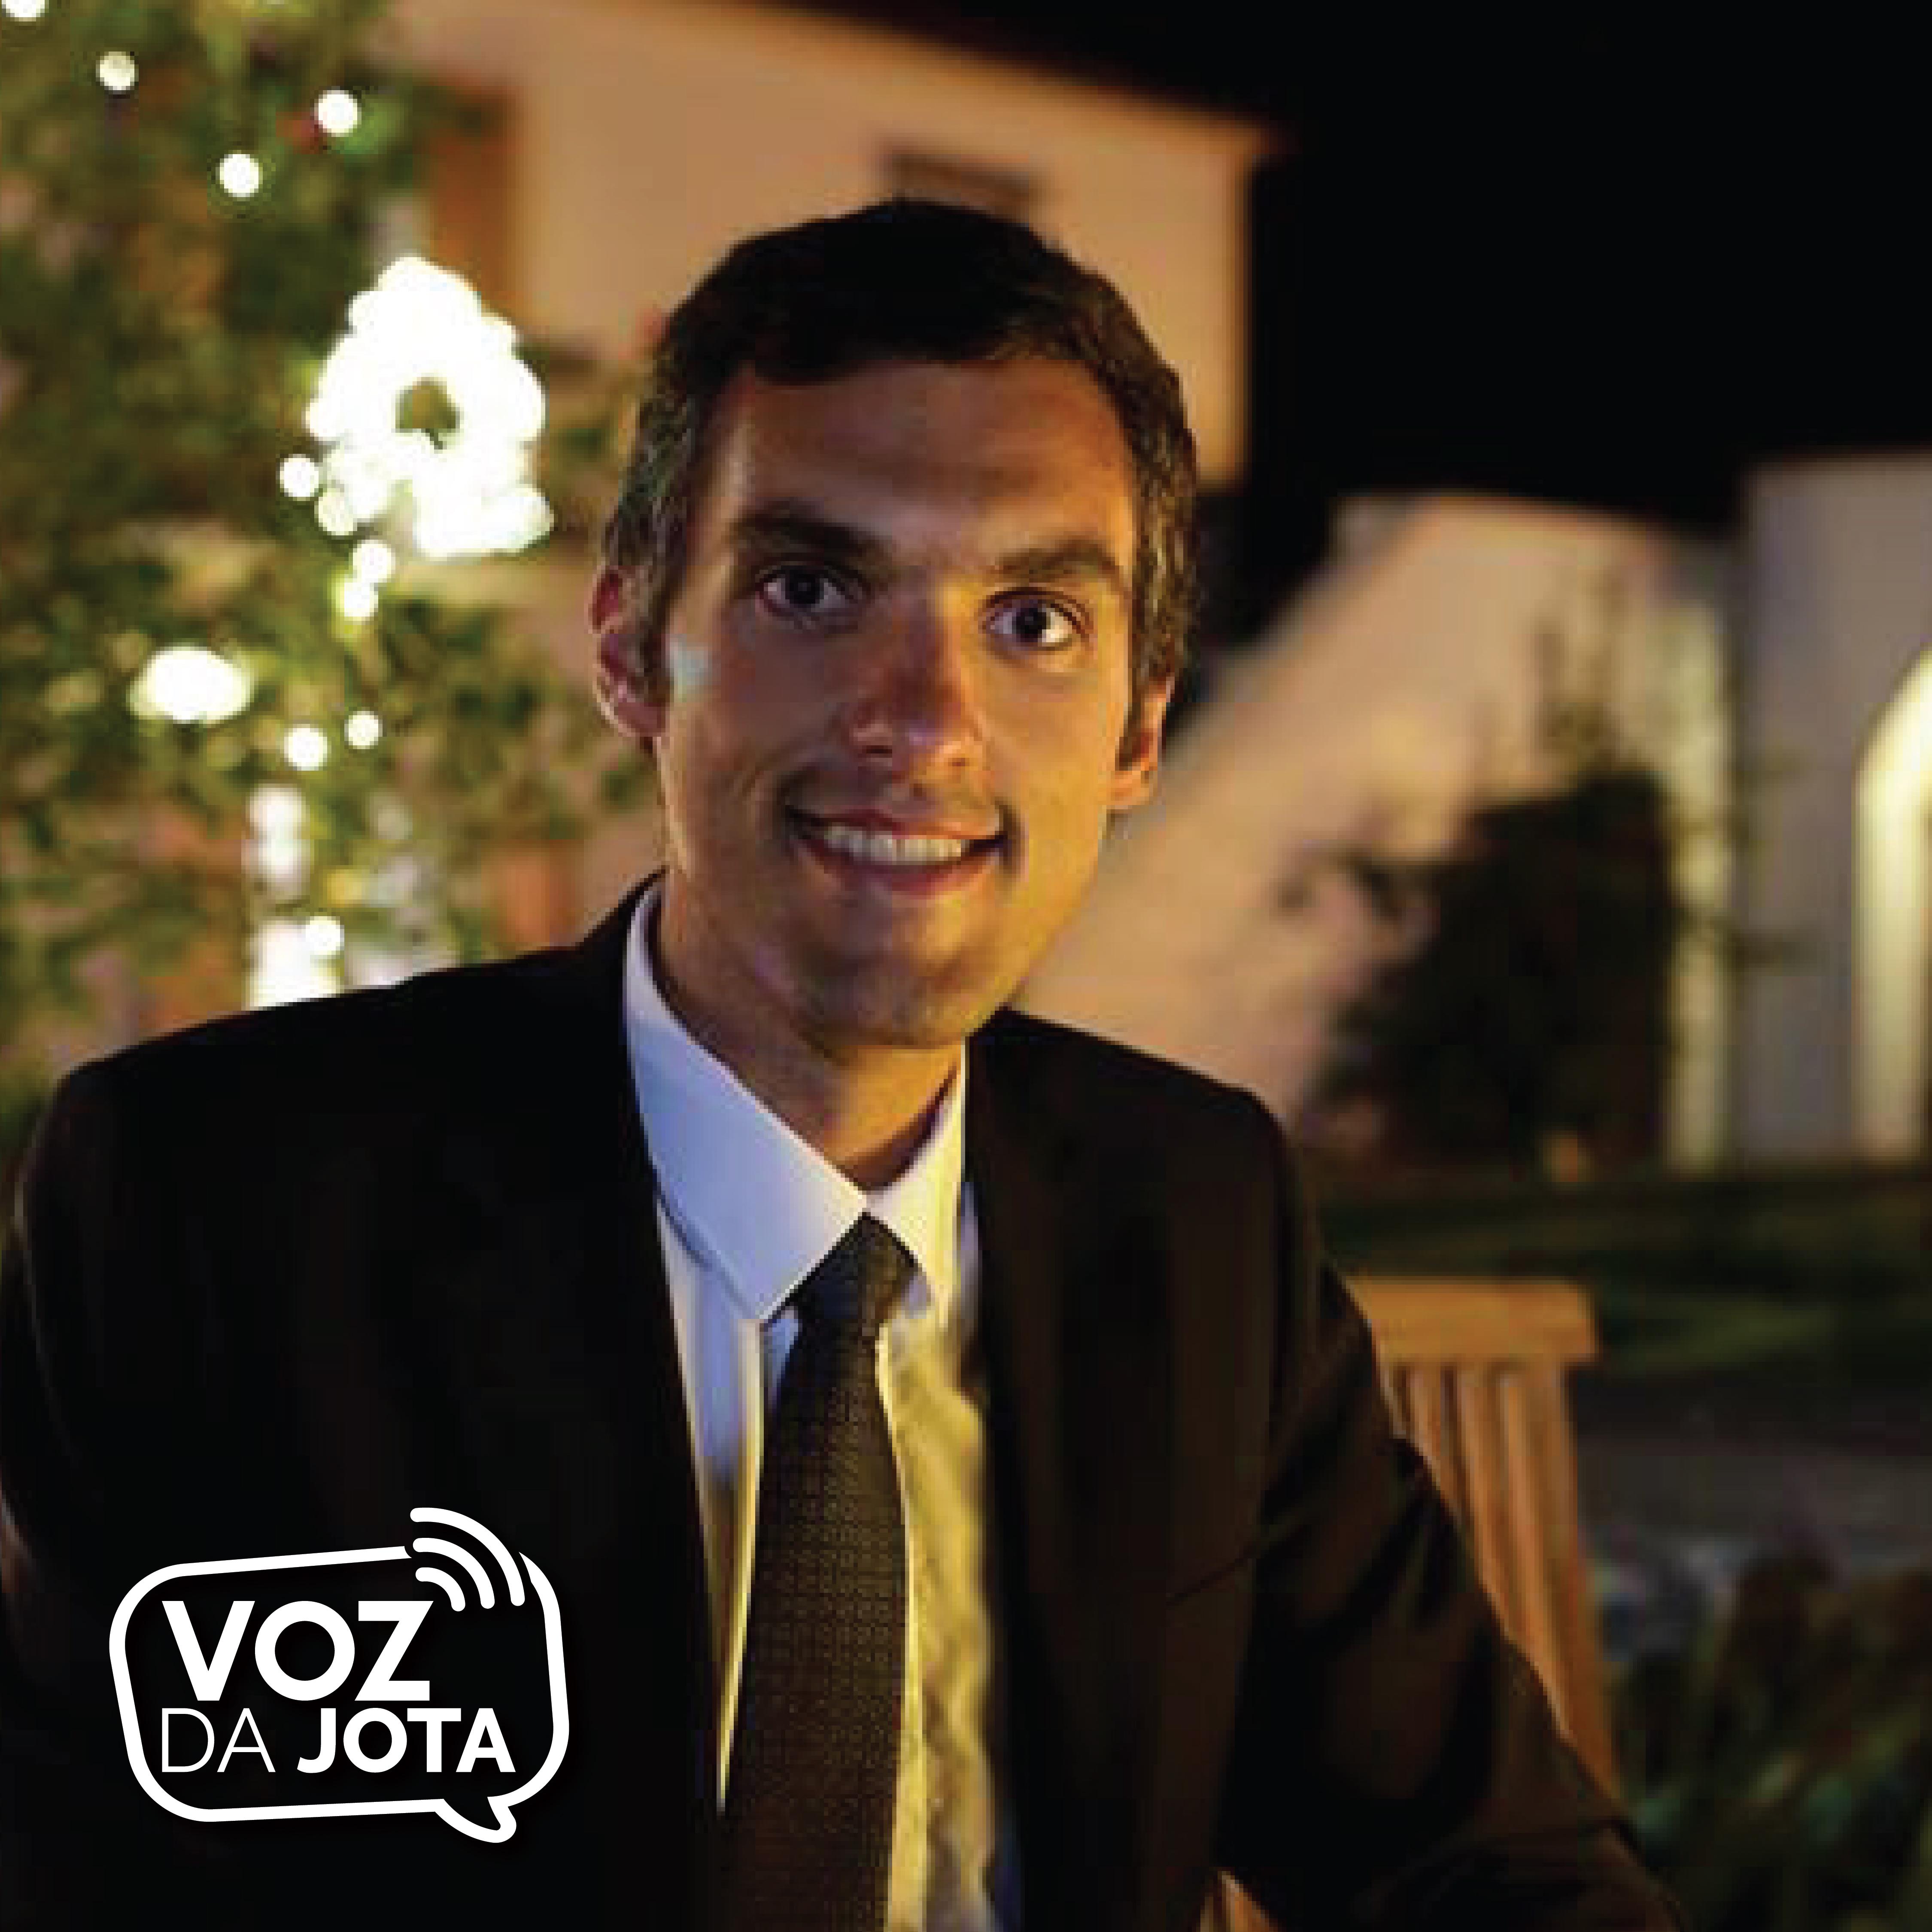 Luis_ramos_freitas_vozdajota_site